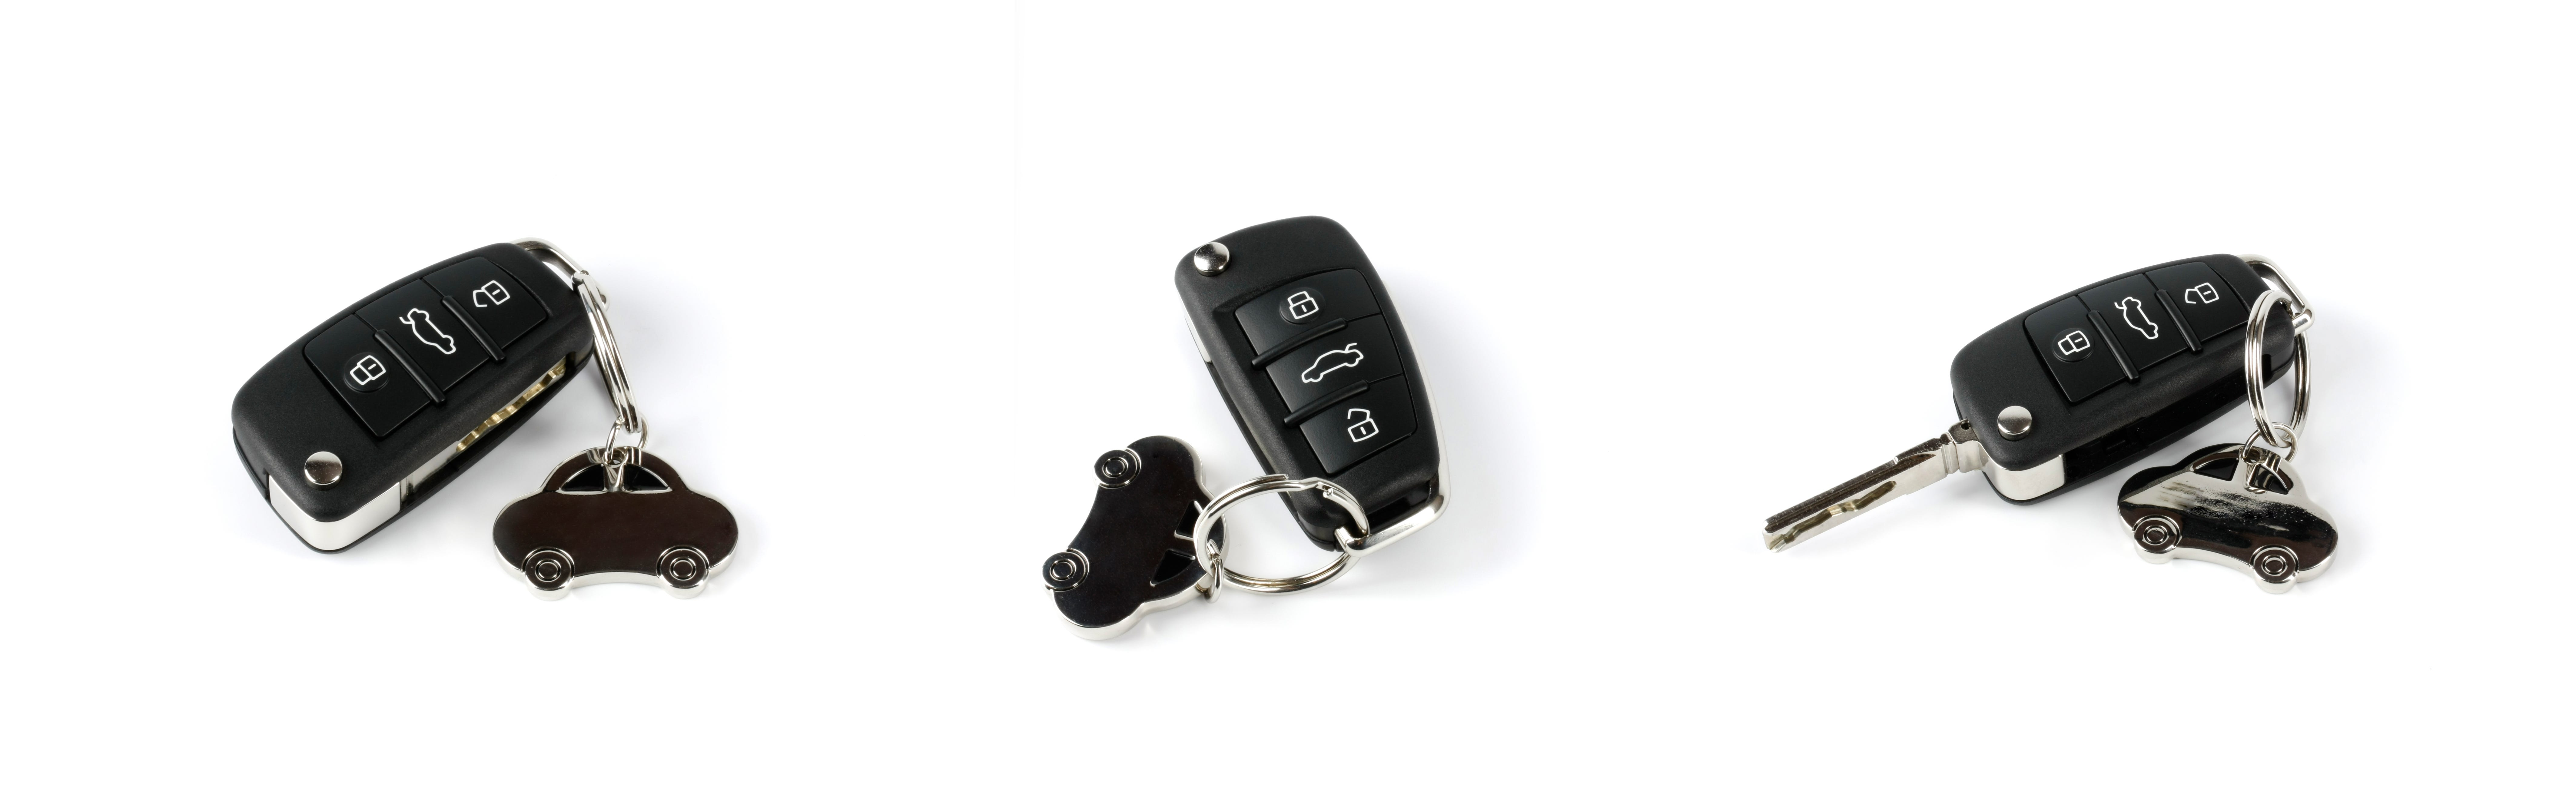 Fear No Evil Key Fob Interior Accessories Automotive lastmessage.rip